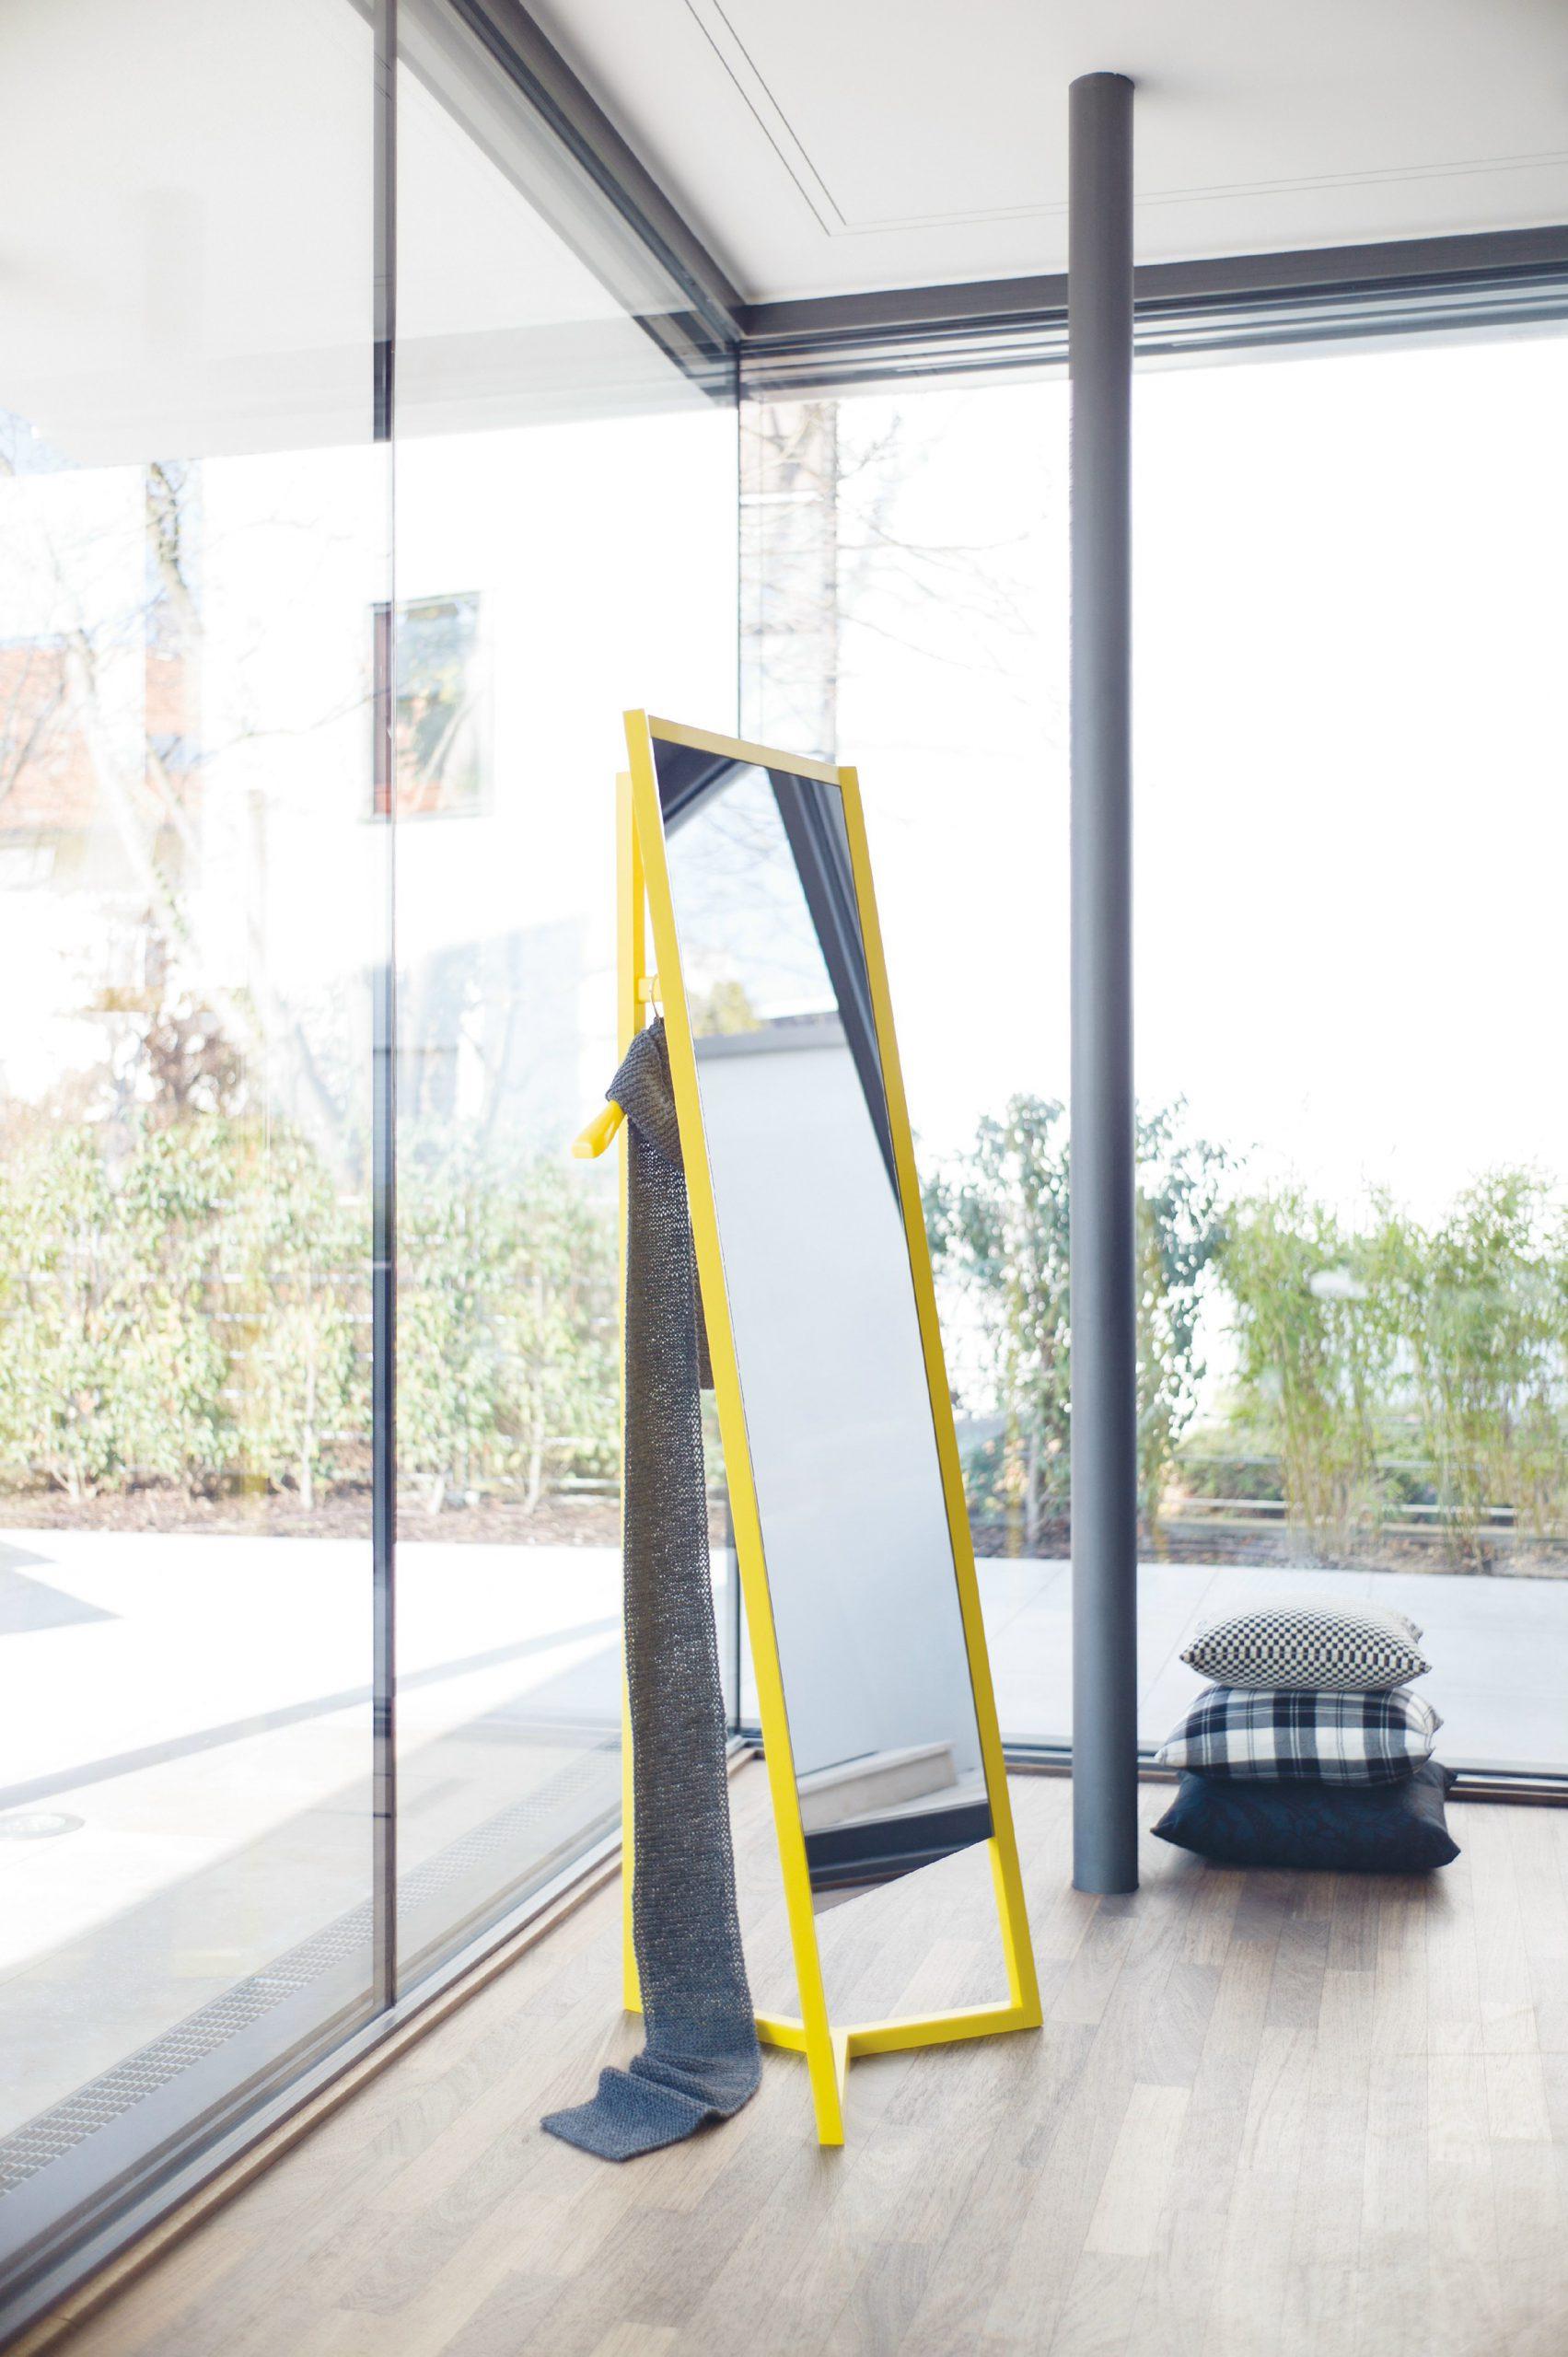 Yellow Club mirror by Debiasi Sandri for Schoenbuch